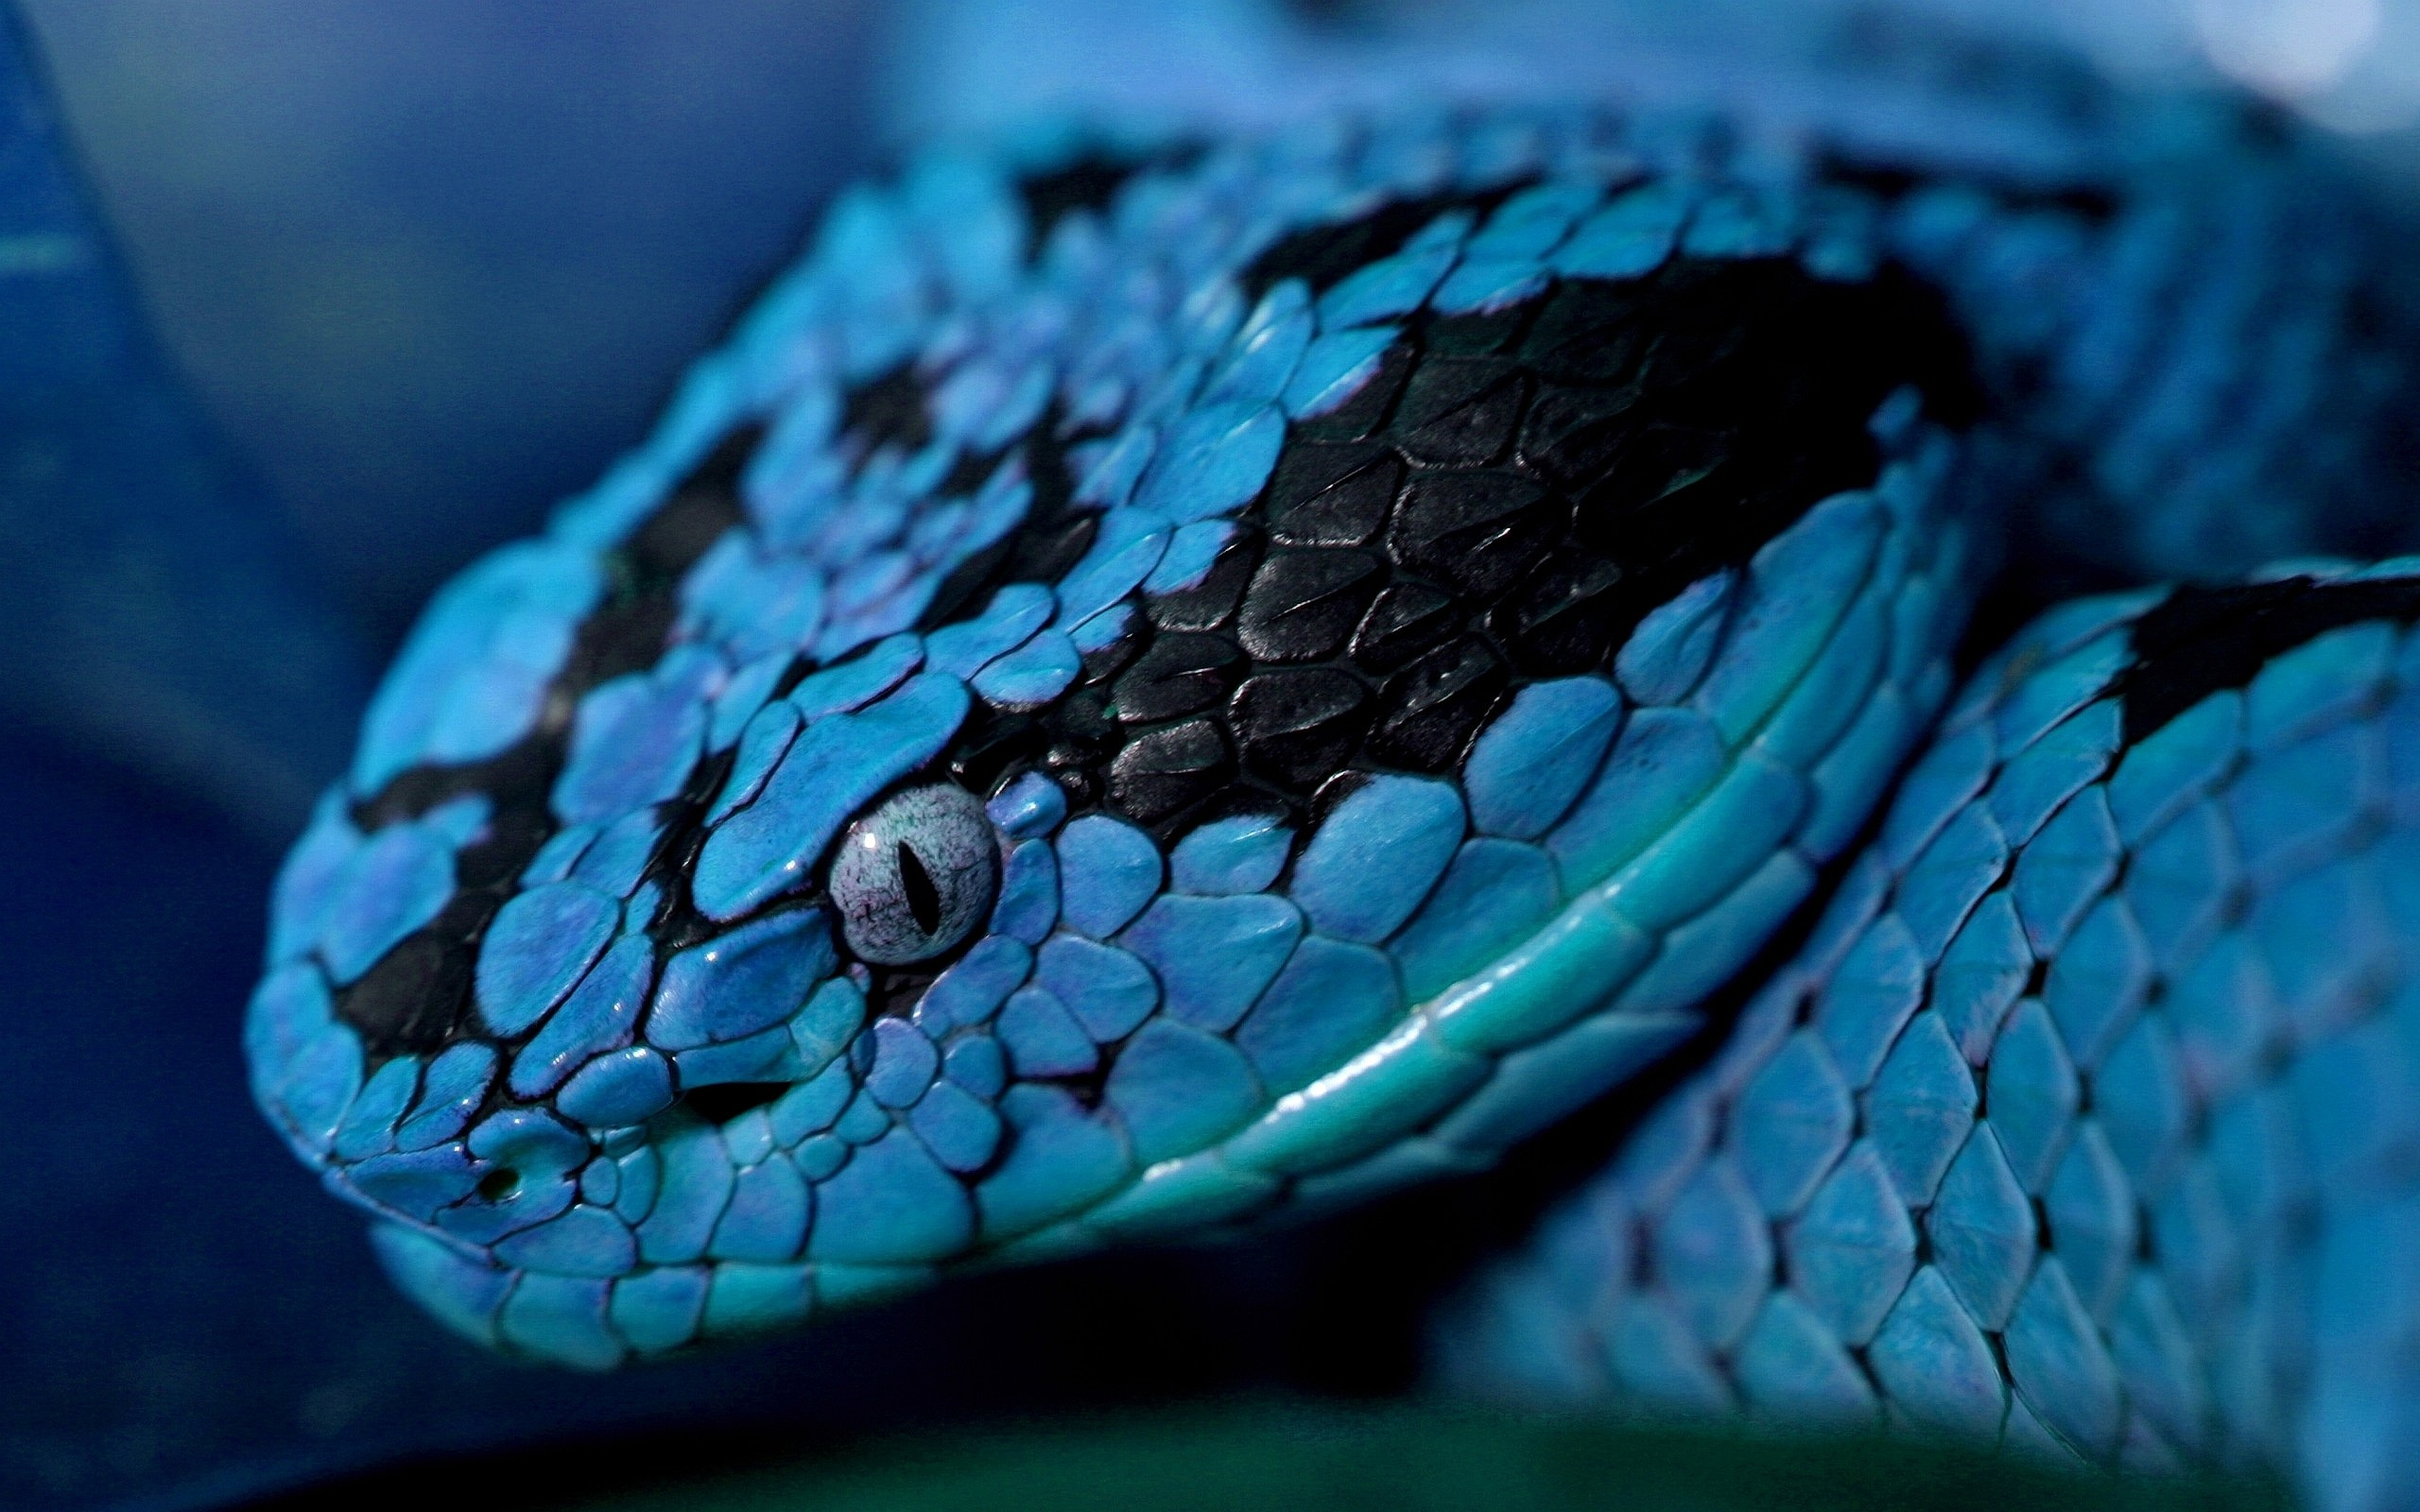 rattlesnake hd